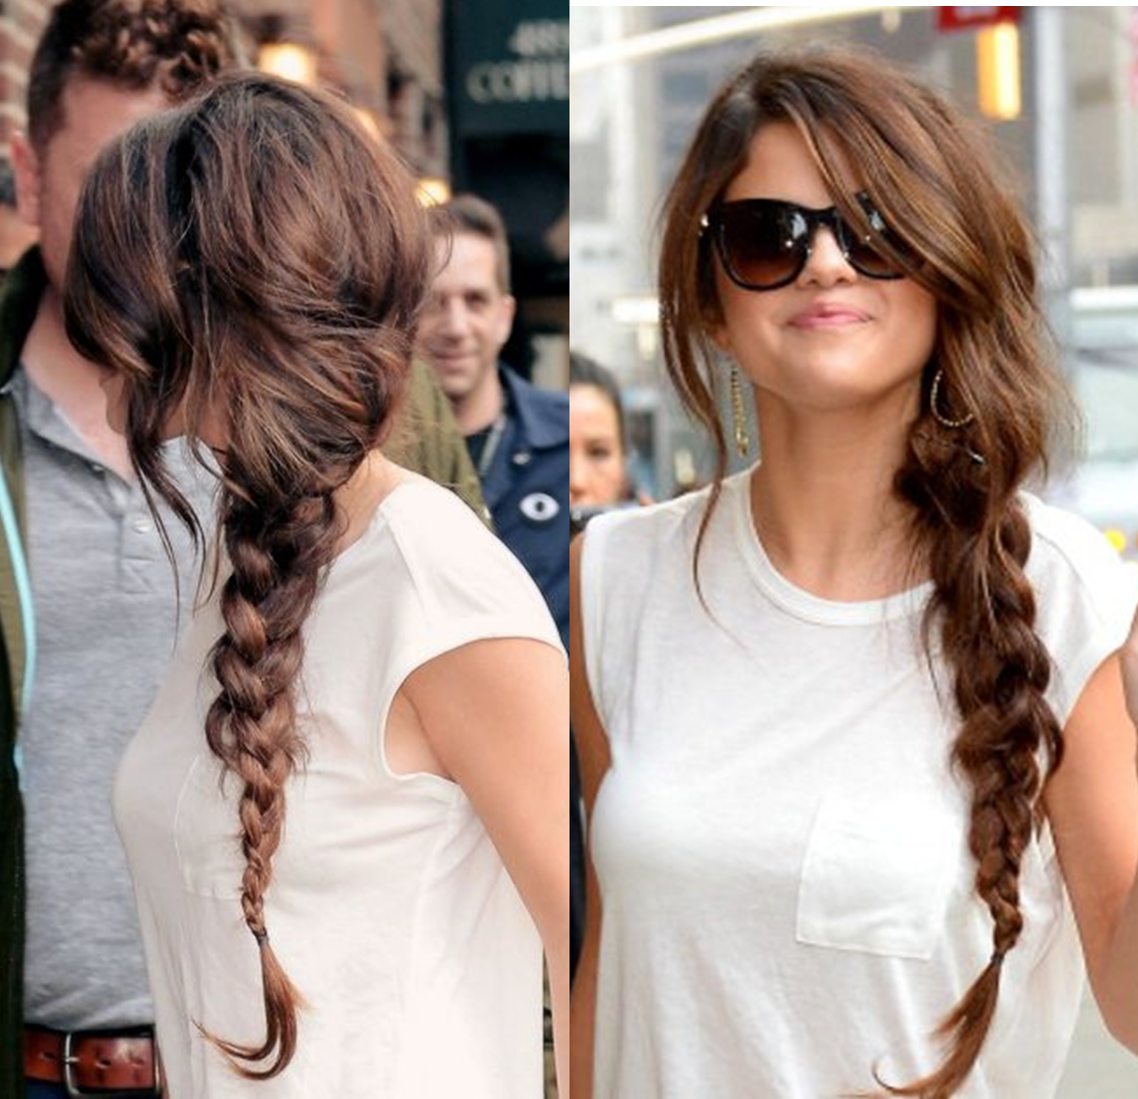 selena gomez summer side braid